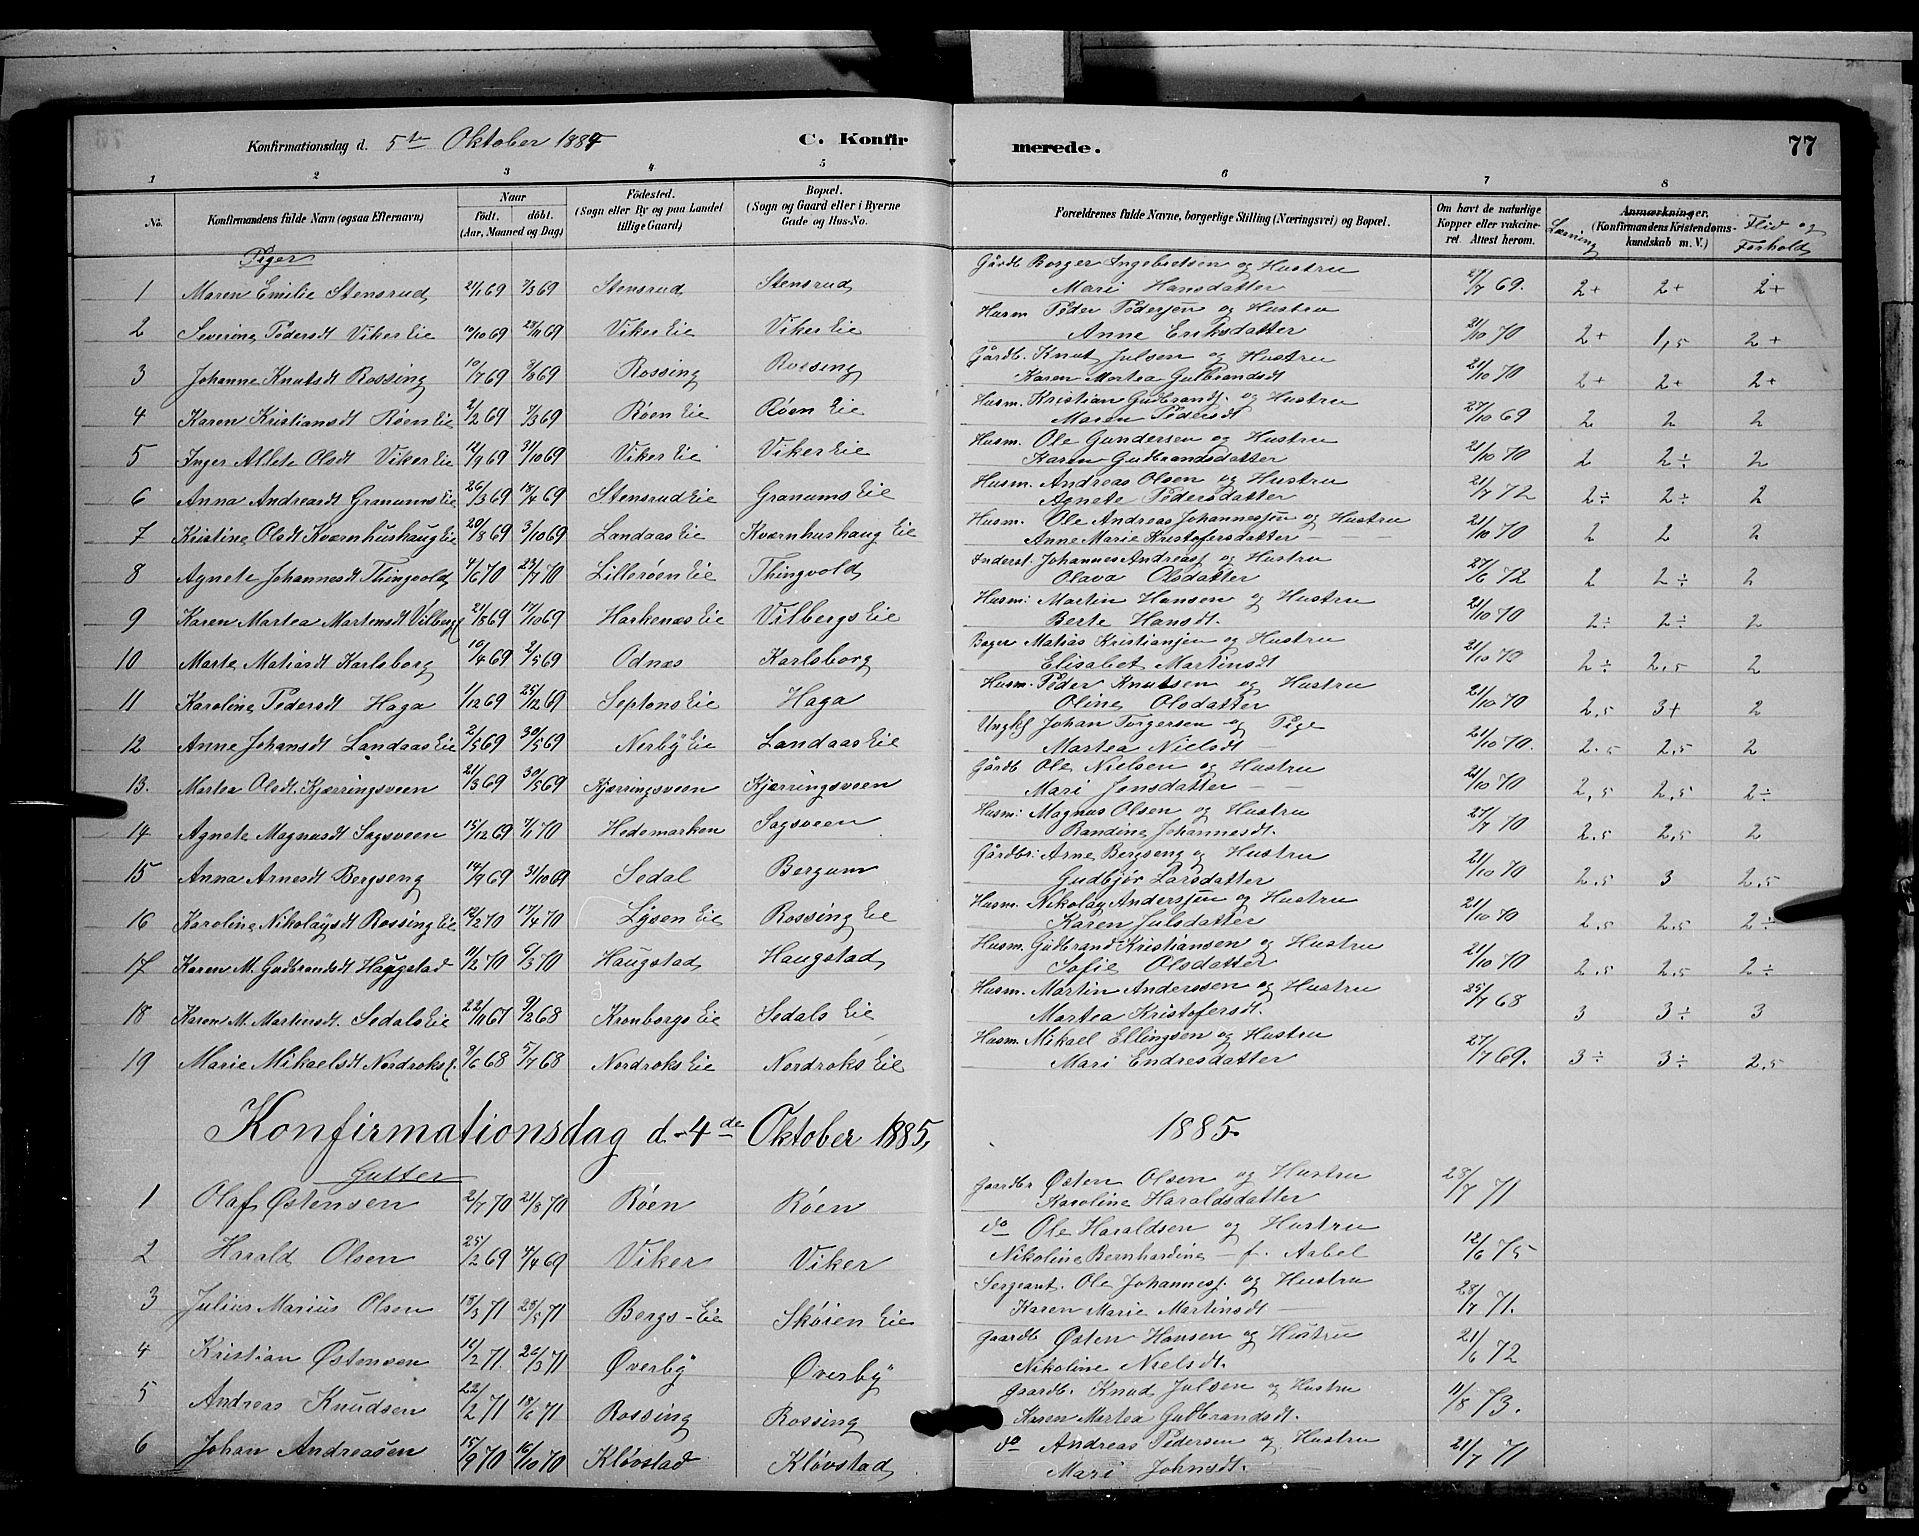 SAH, Søndre Land prestekontor, L/L0003: Klokkerbok nr. 3, 1884-1902, s. 77